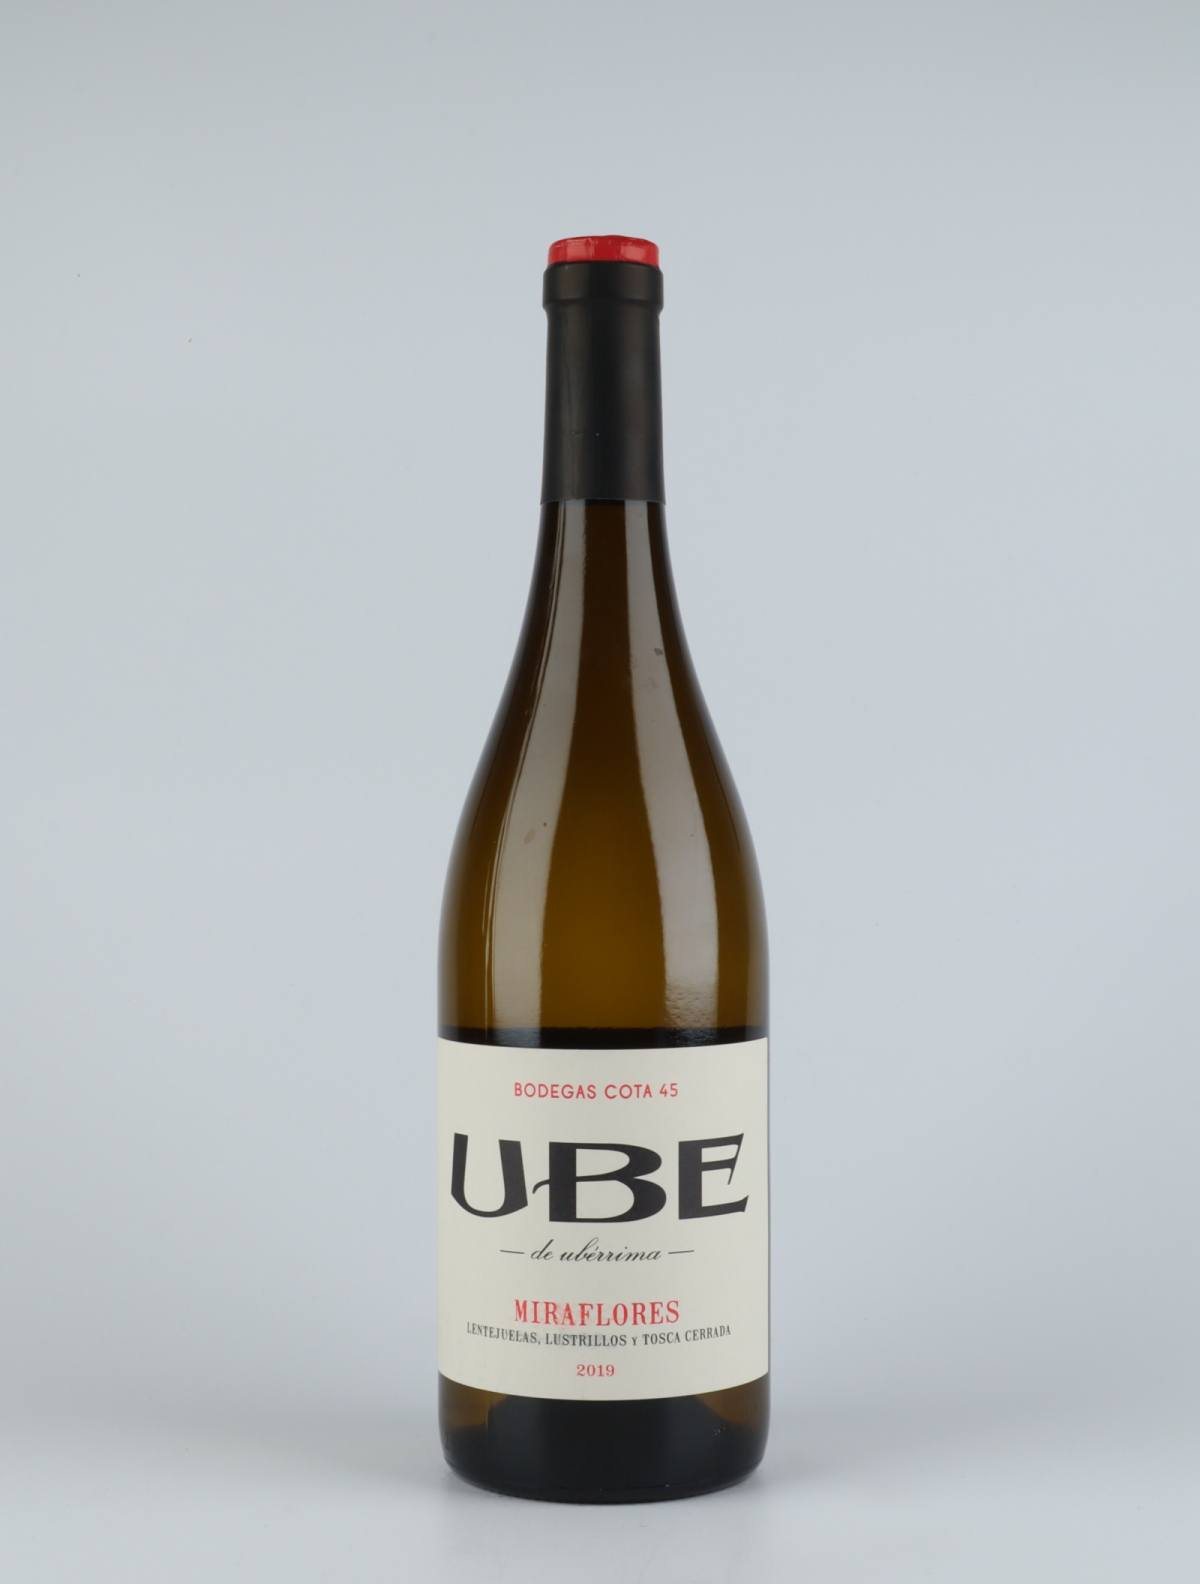 UBE Miraflores